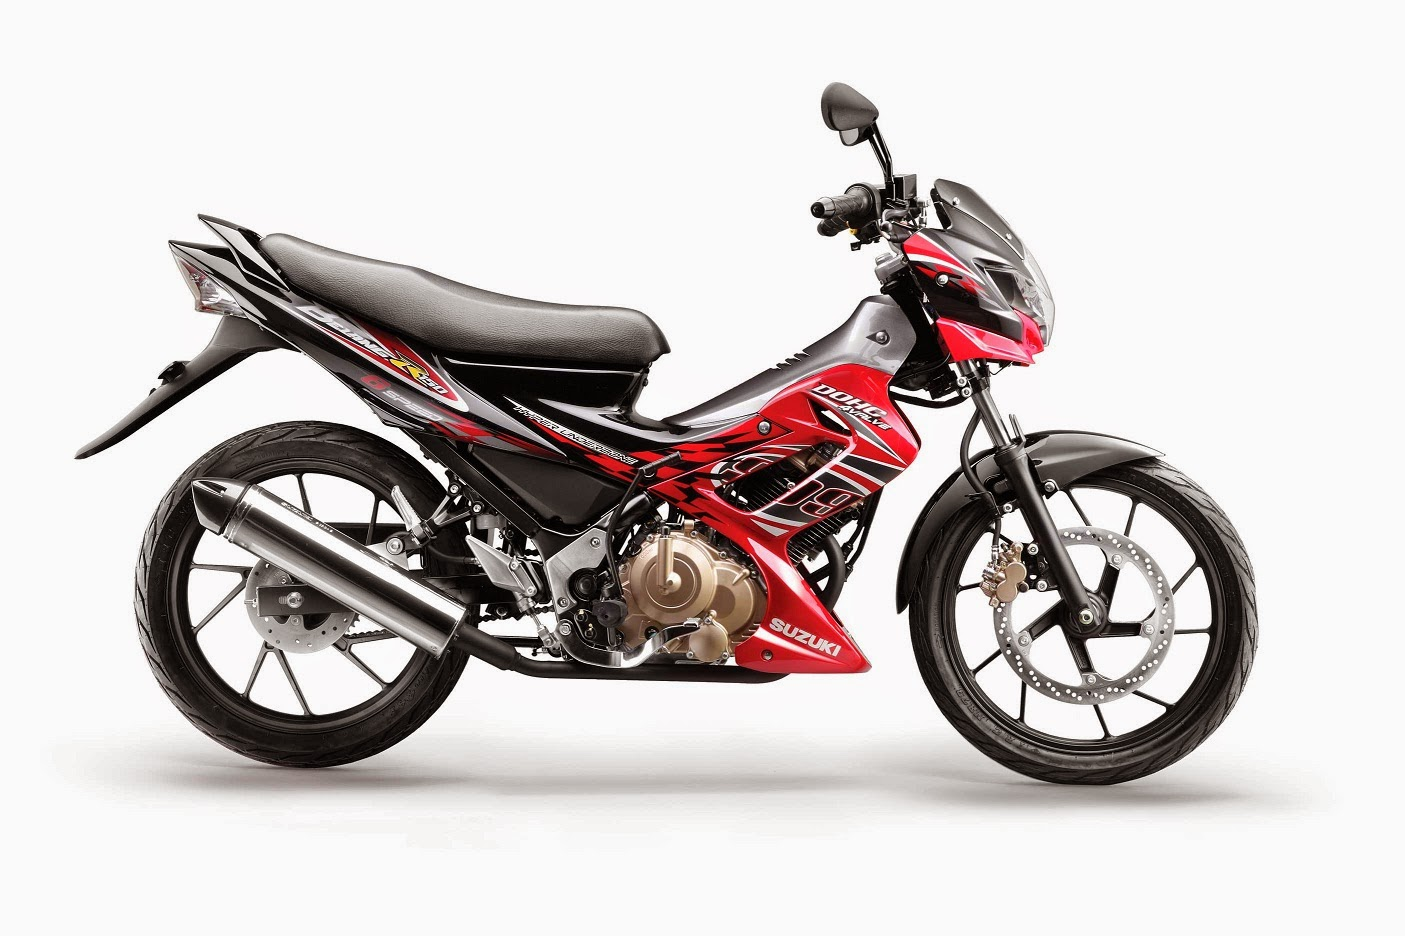 Spesifikasi dan Harga Motor Satria Fu 150cc